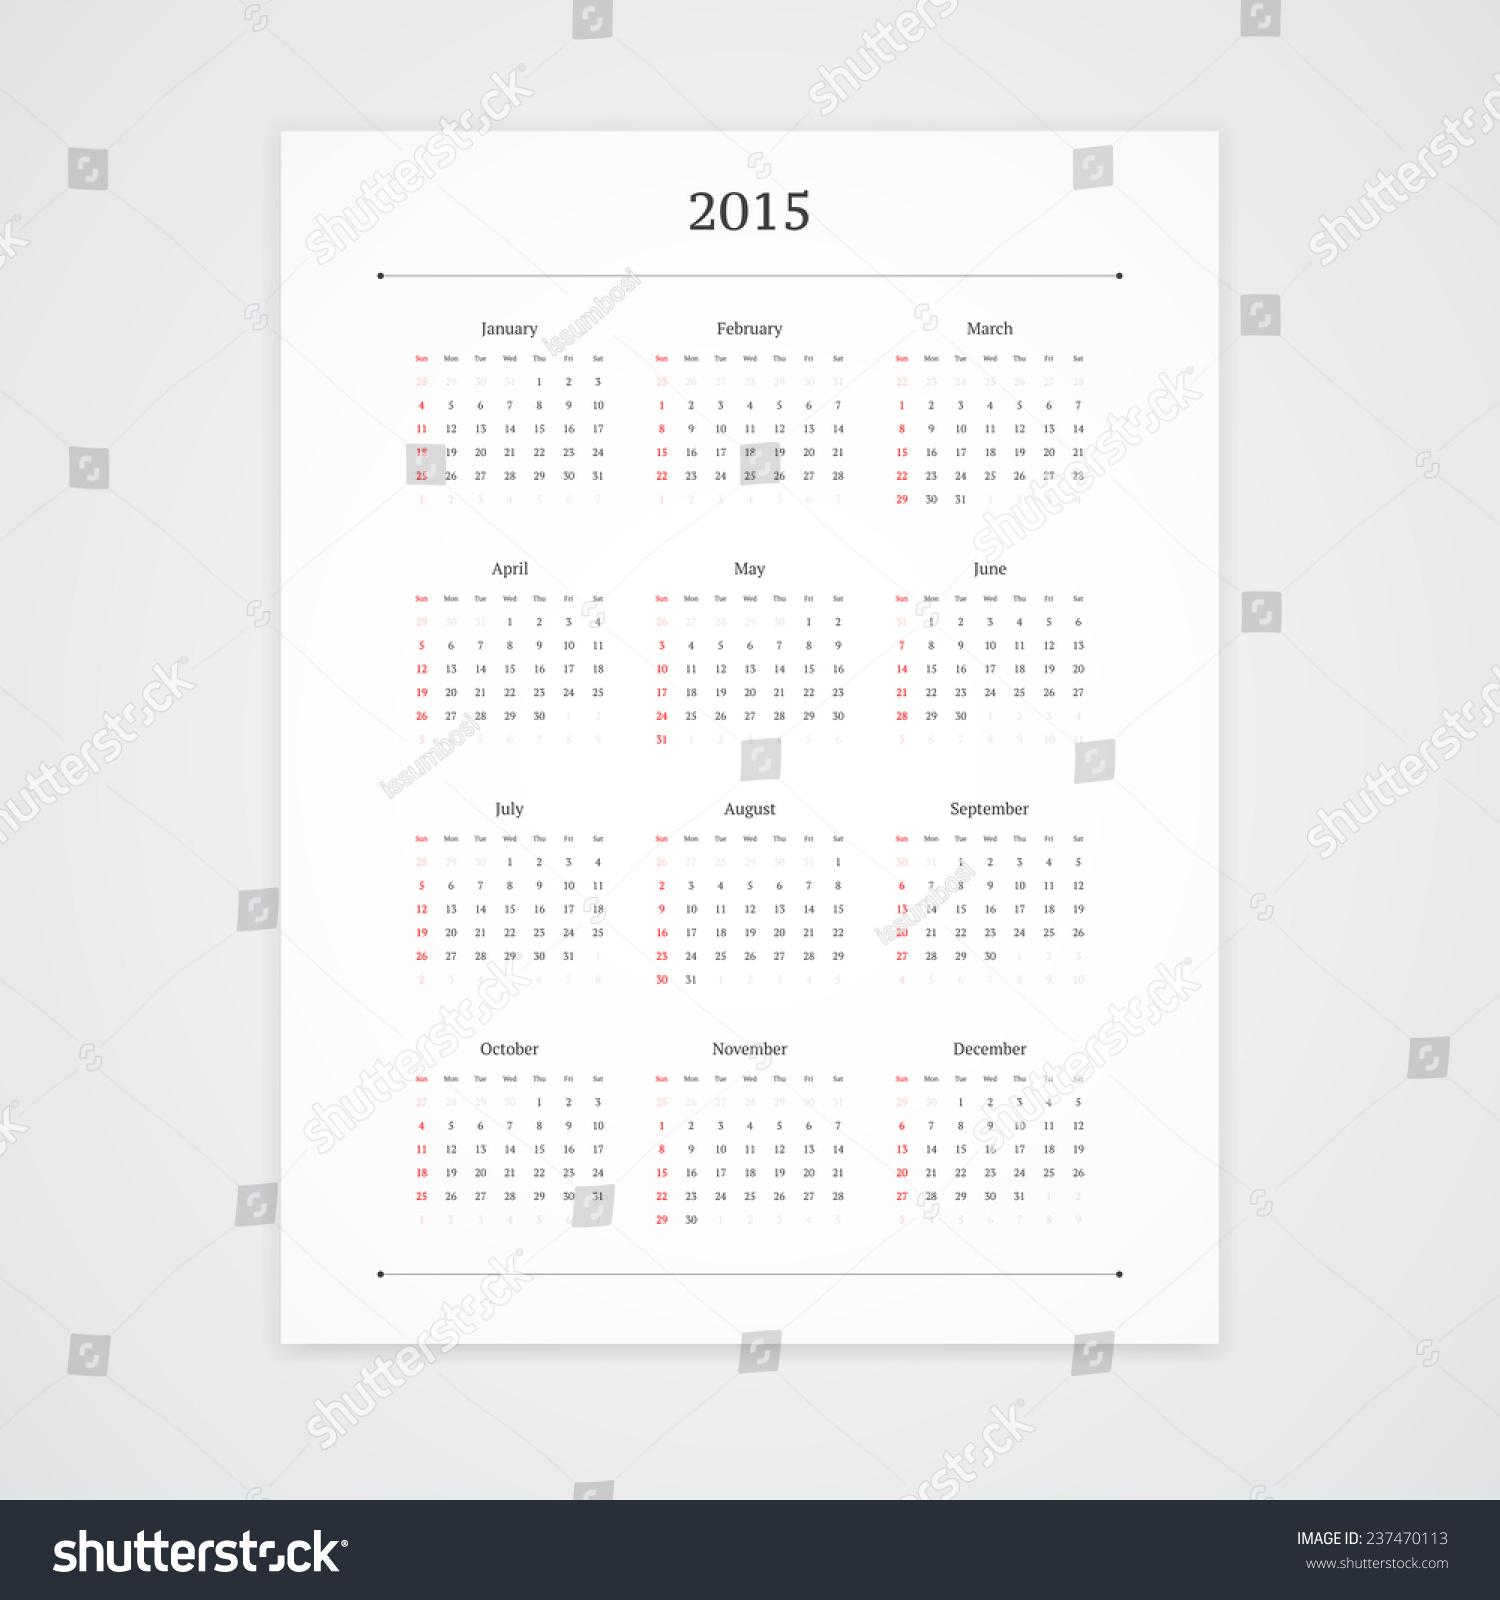 Minimalist Calendar Template : Simple calendar vector template isolated stock